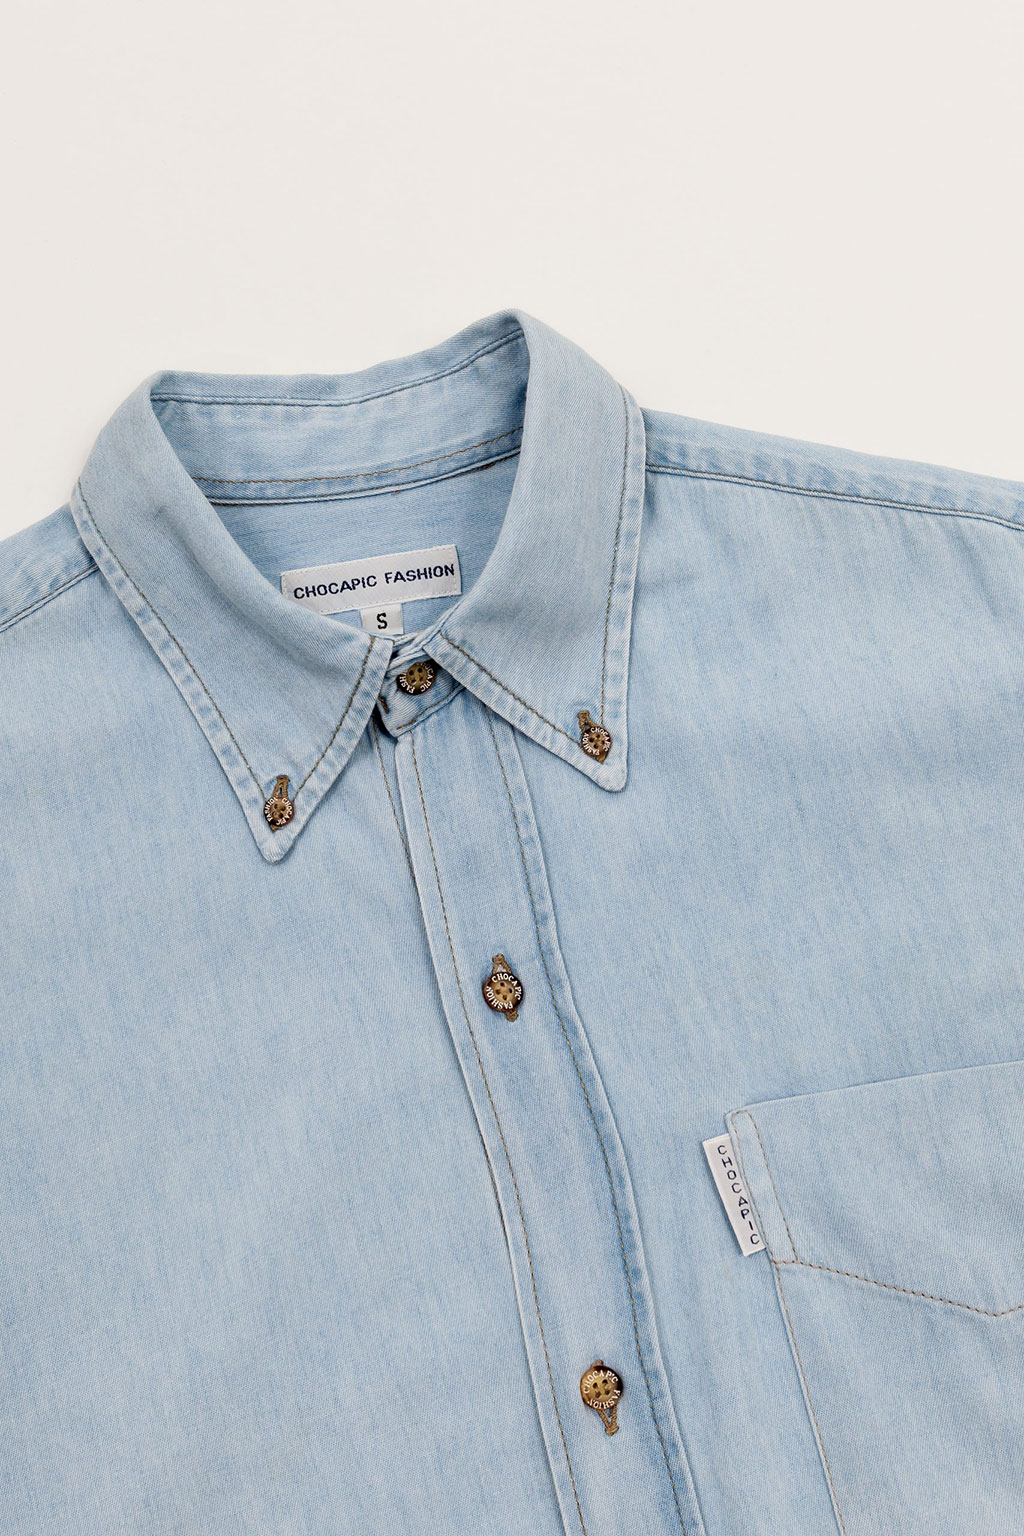 camisa botoes etiqueta personalizada